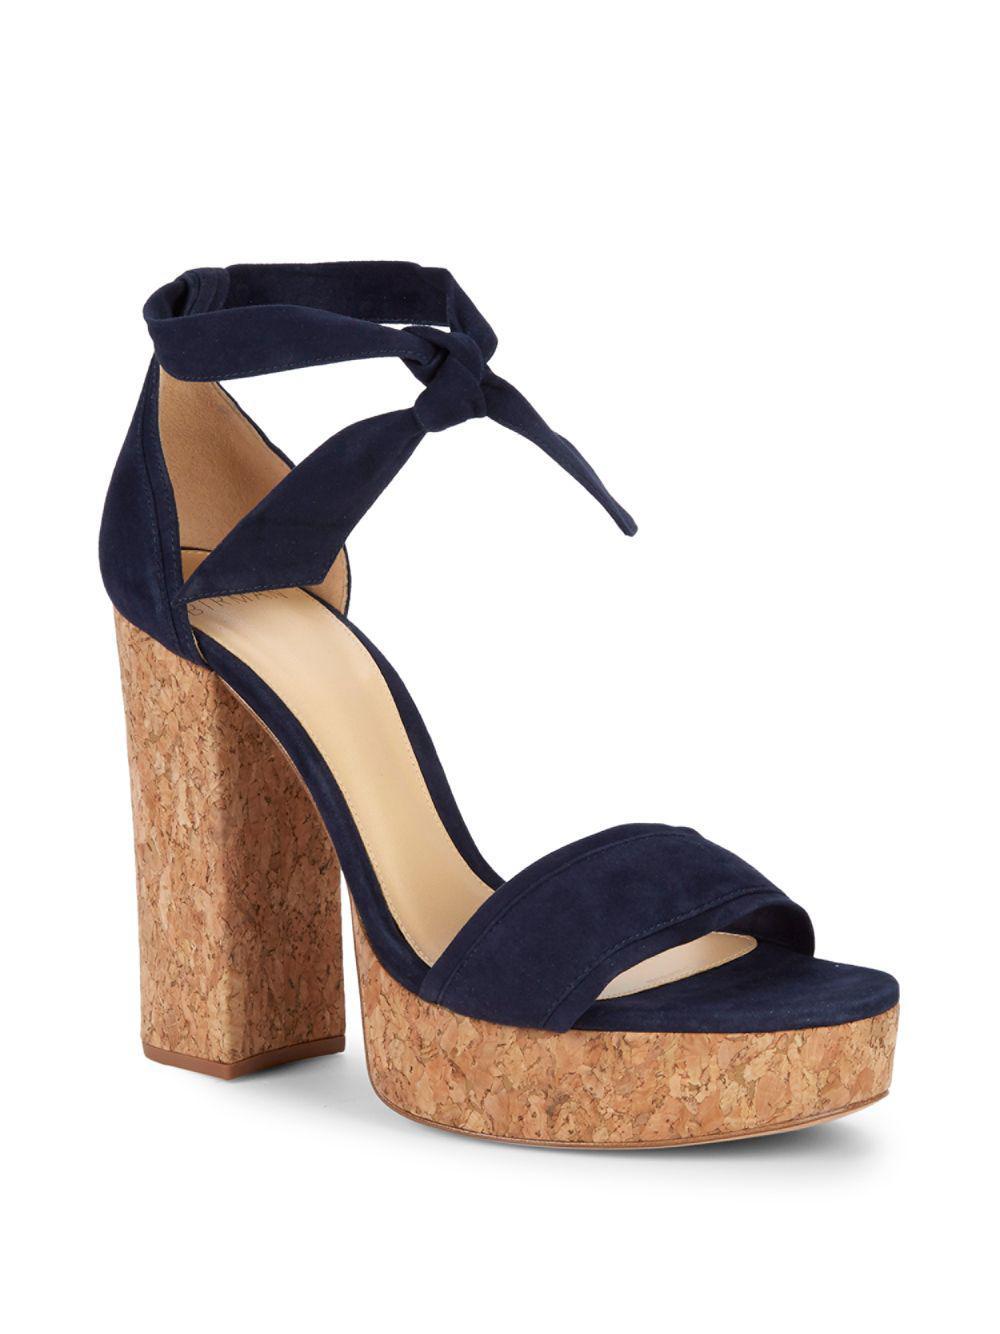 3d317ccf961 Lyst - Alexandre Birman Celine Cork Platform Sandals in Blue